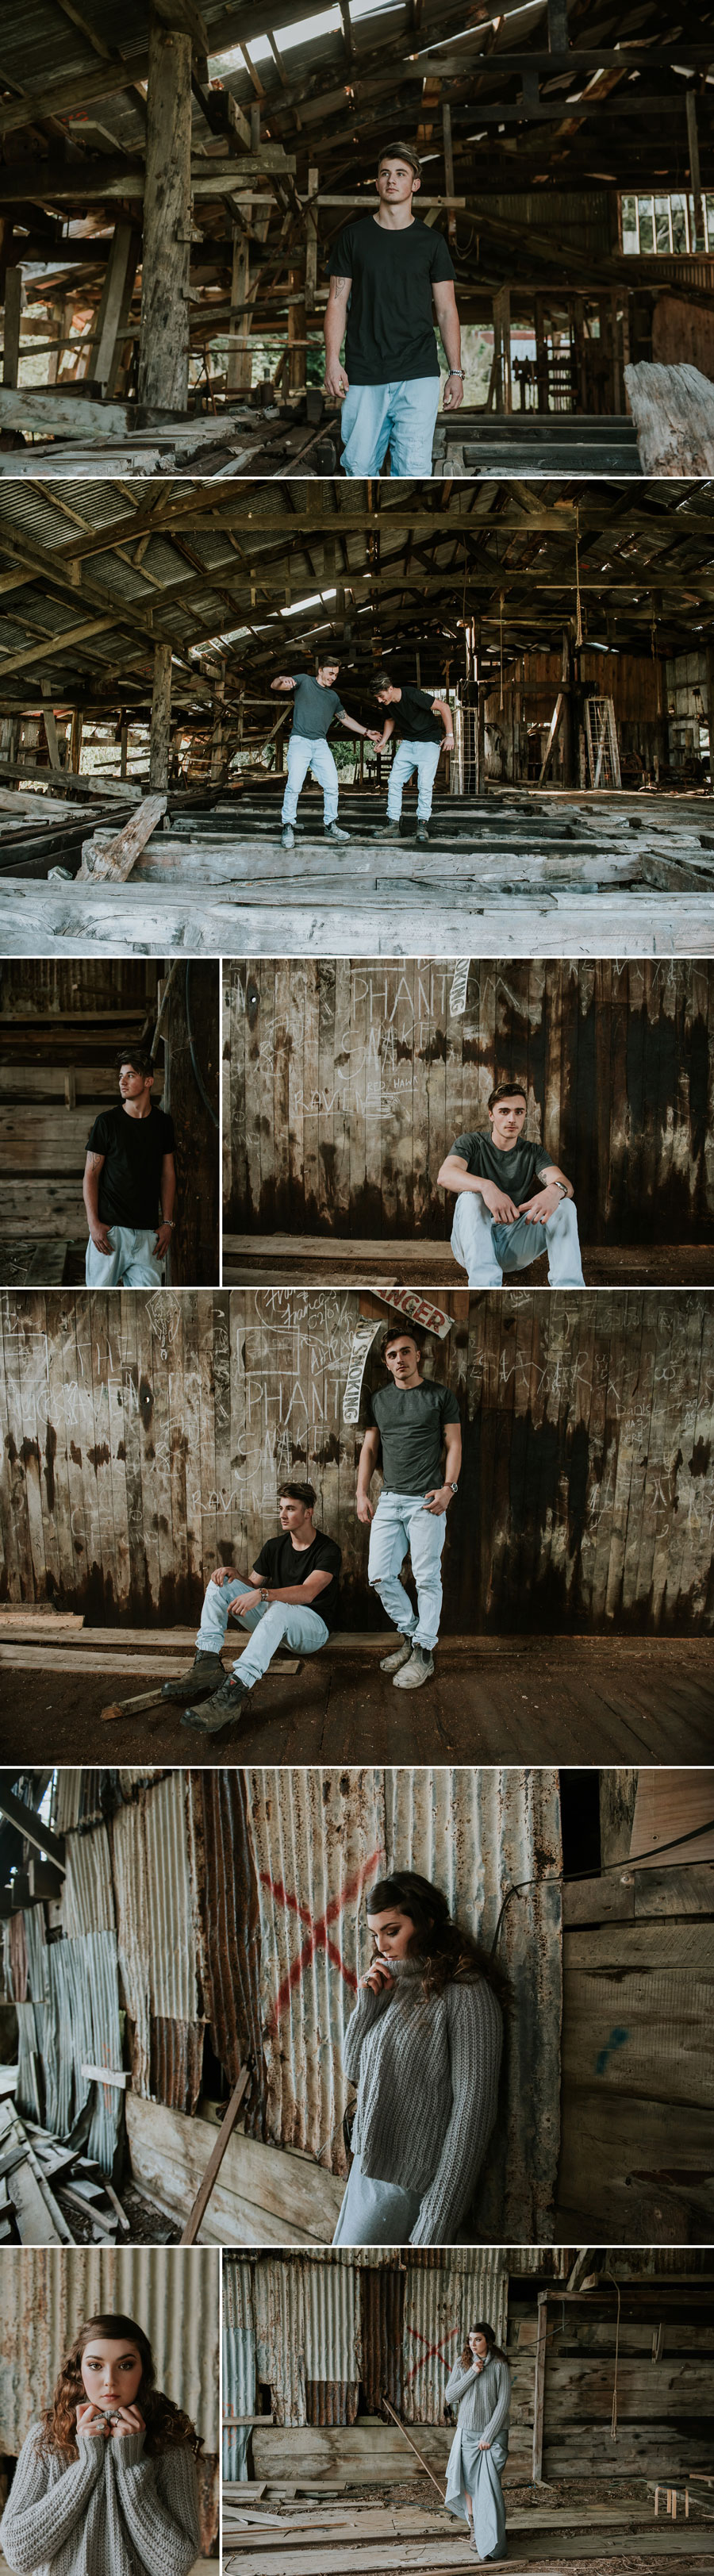 2_northland_jess-burges_-photorapher_editorial